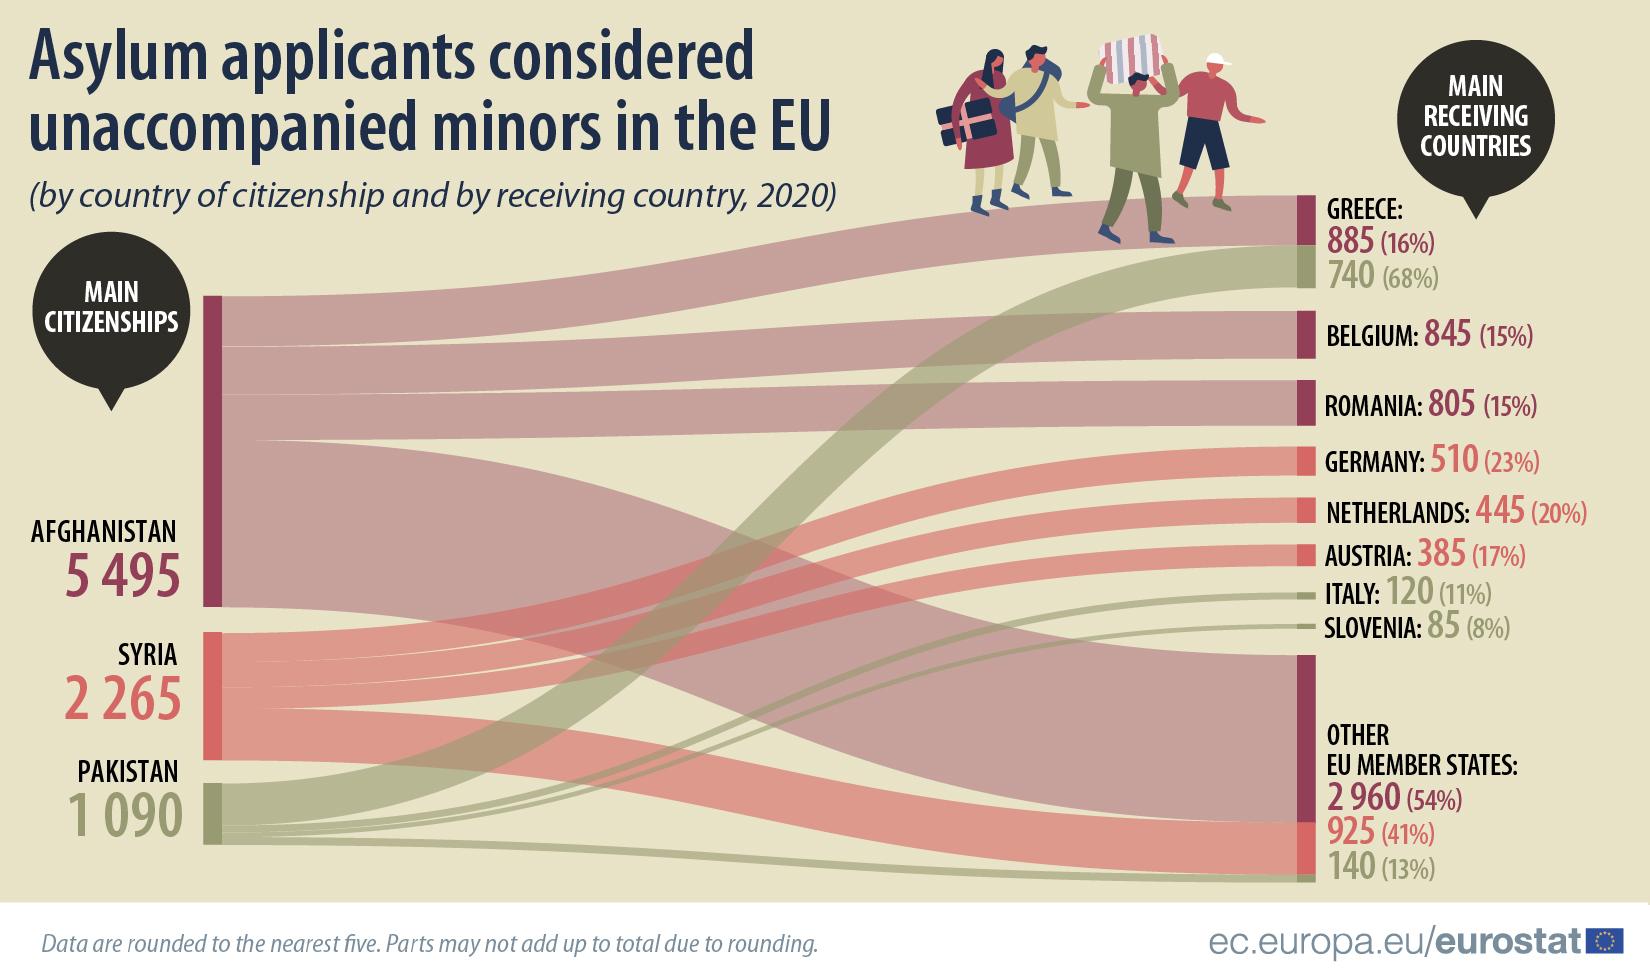 Asylum applicants unaccompanied minors top 3 2020